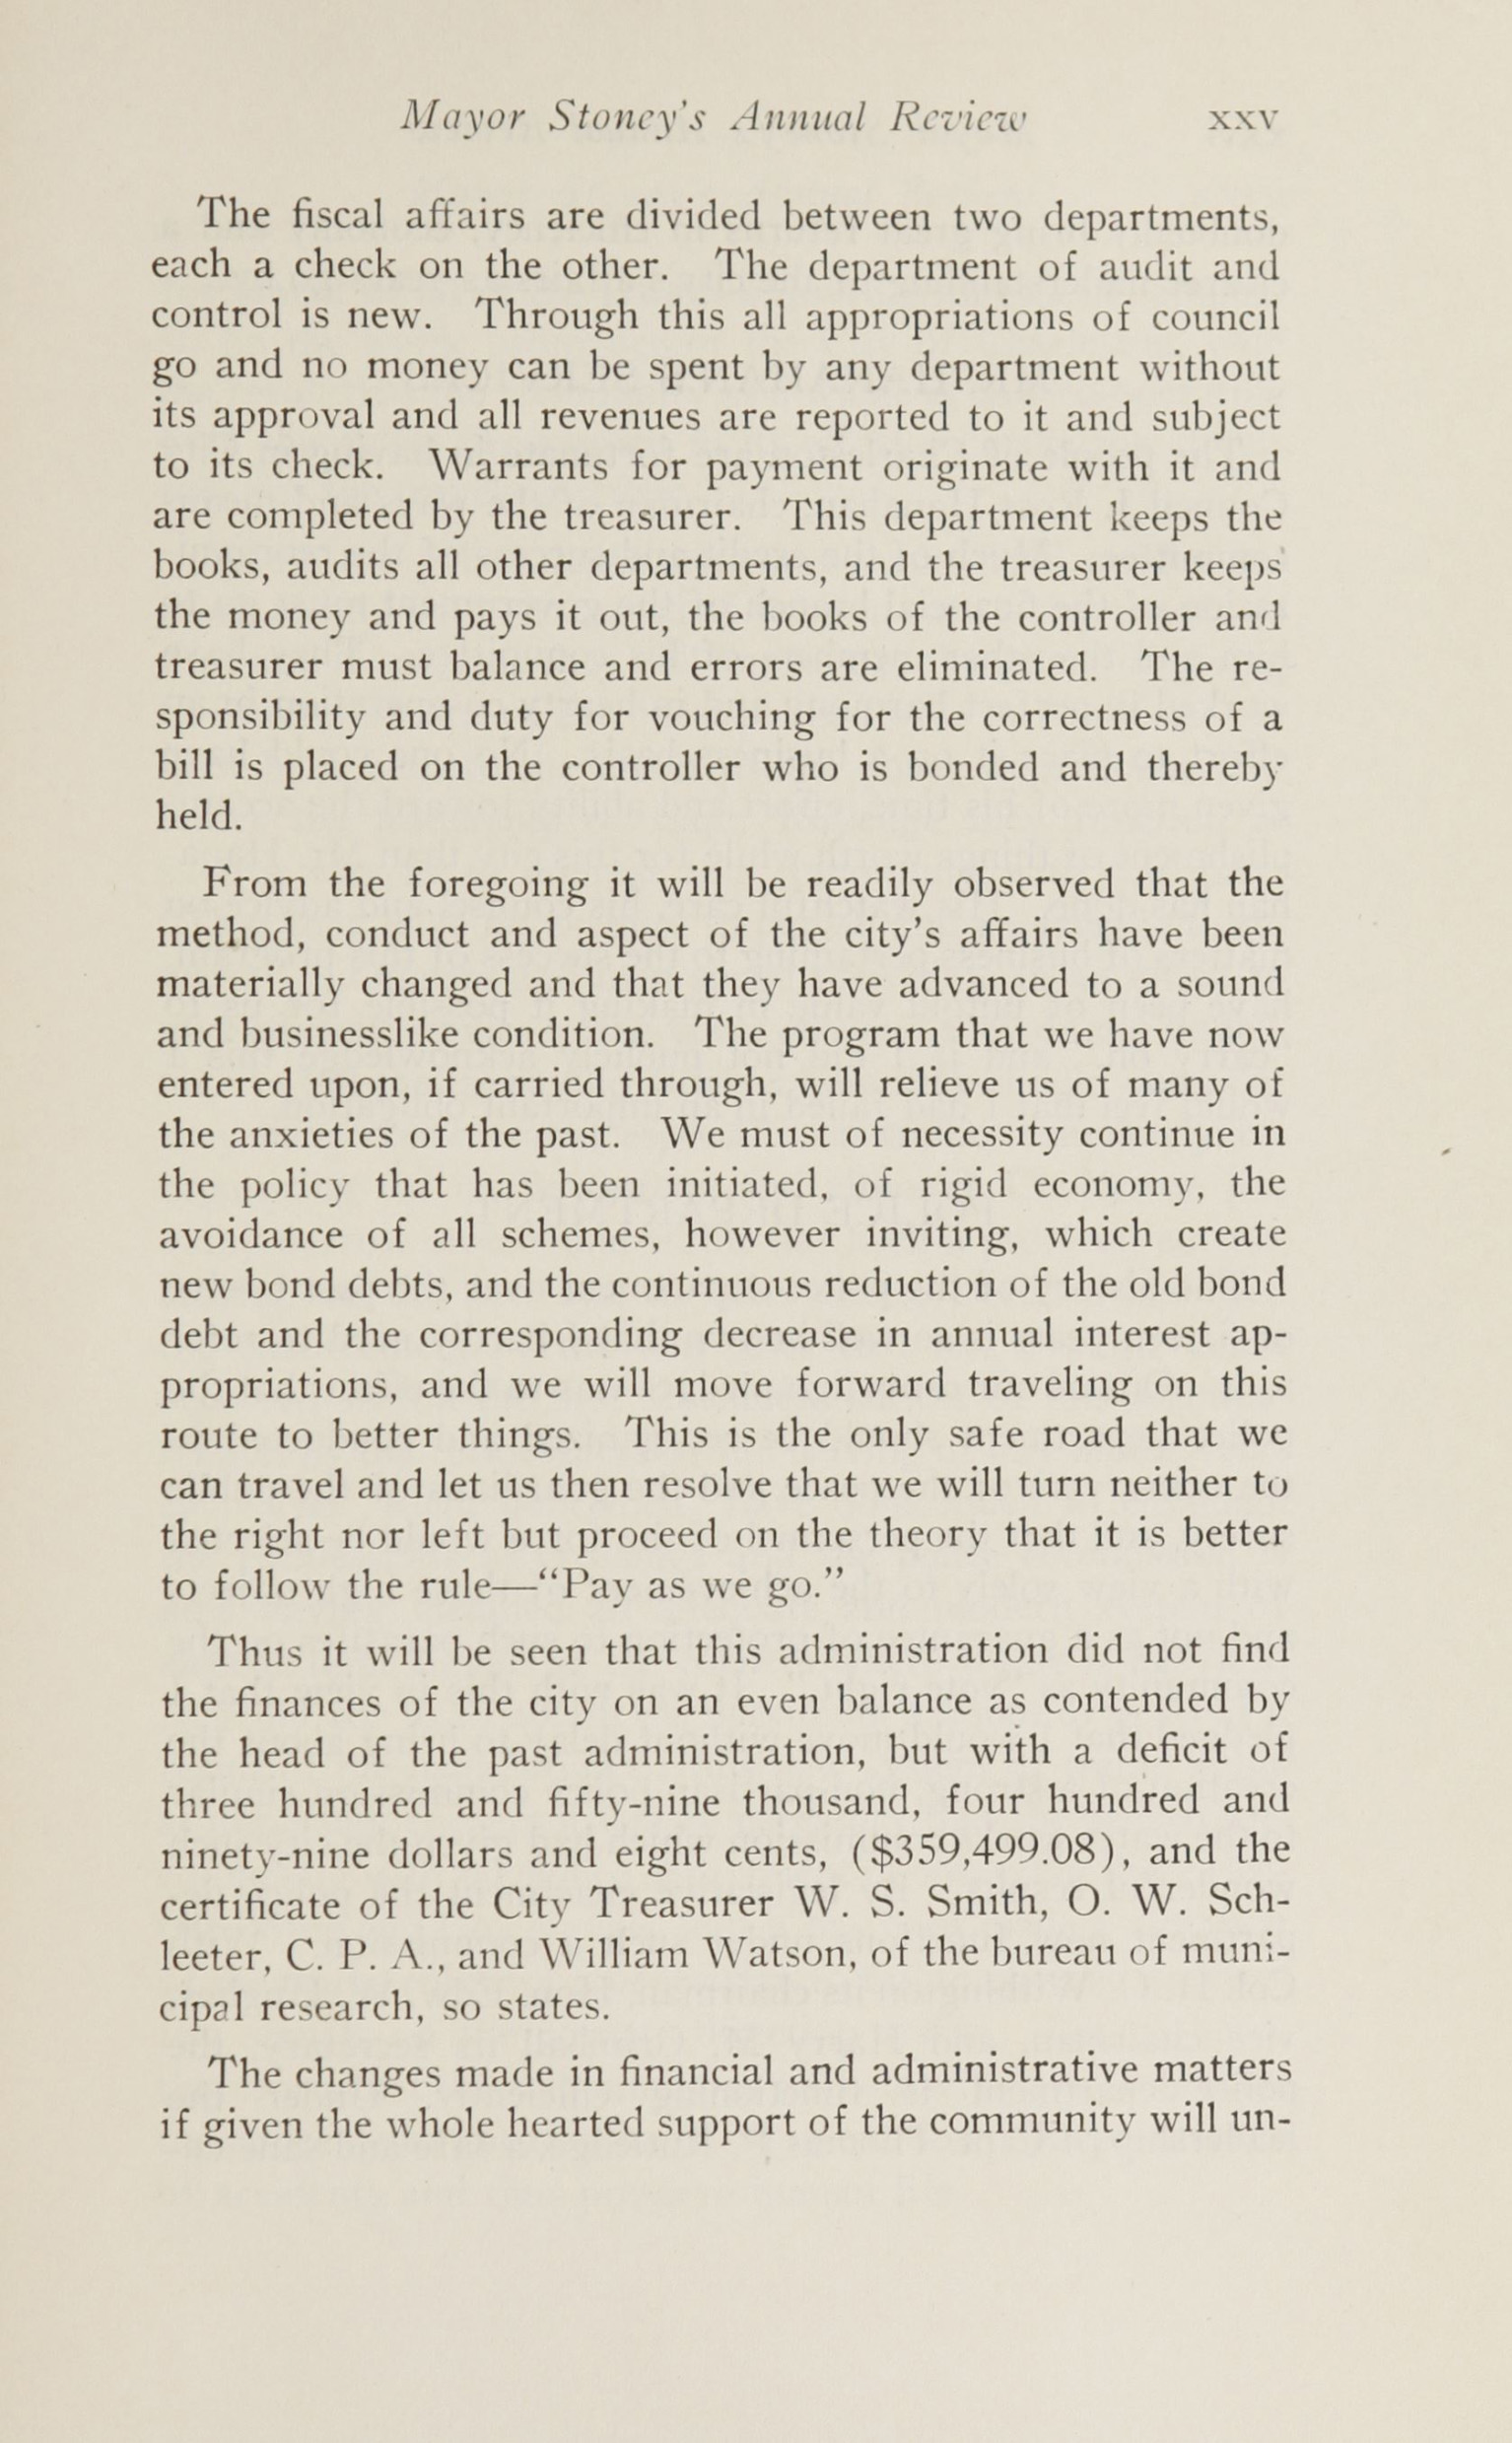 Charleston Yearbook, 1924, page xxv